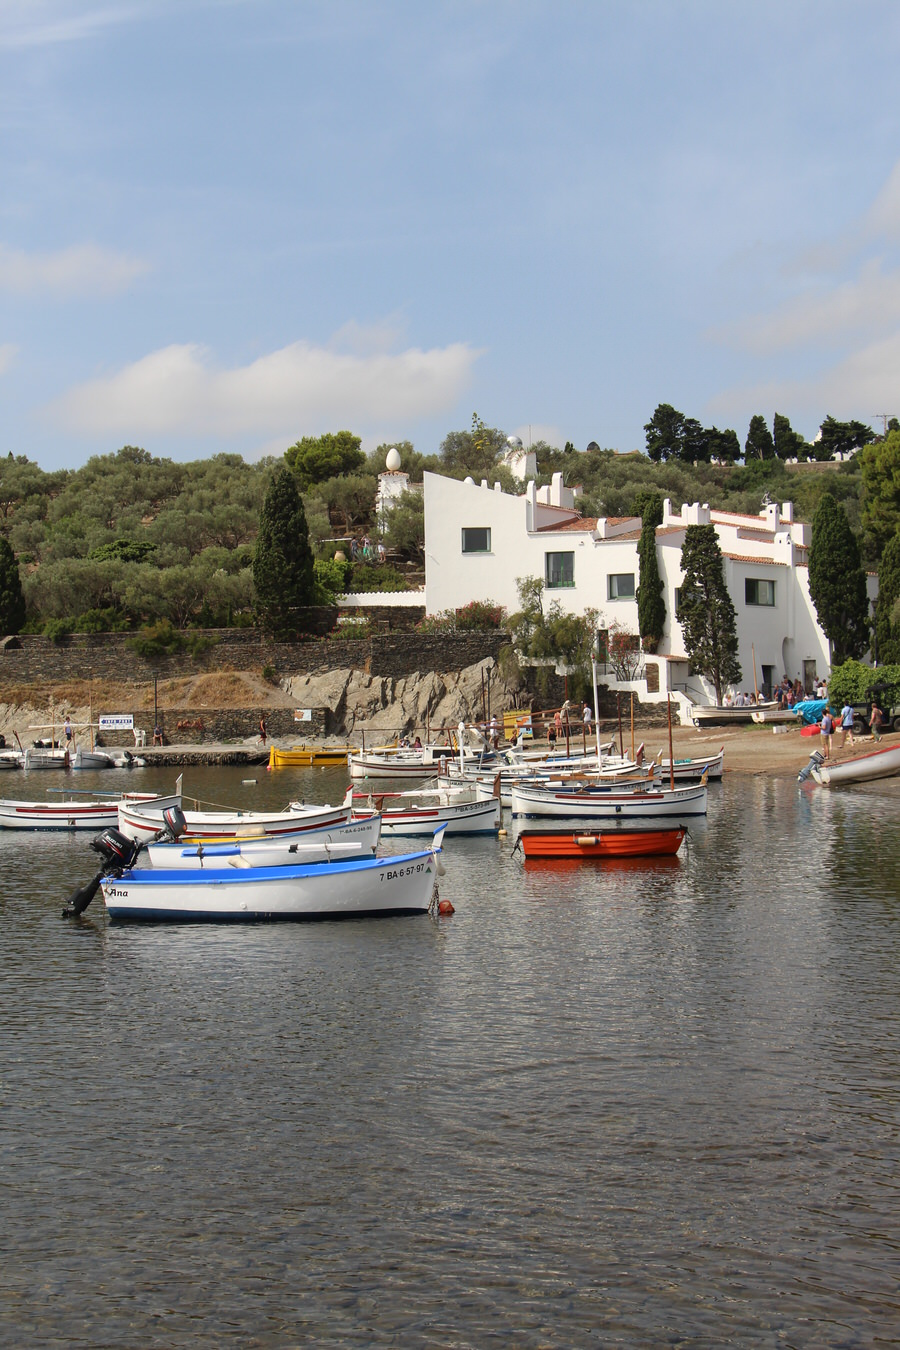 Muelle con la Casa de Dalí al fondo, Portlligat